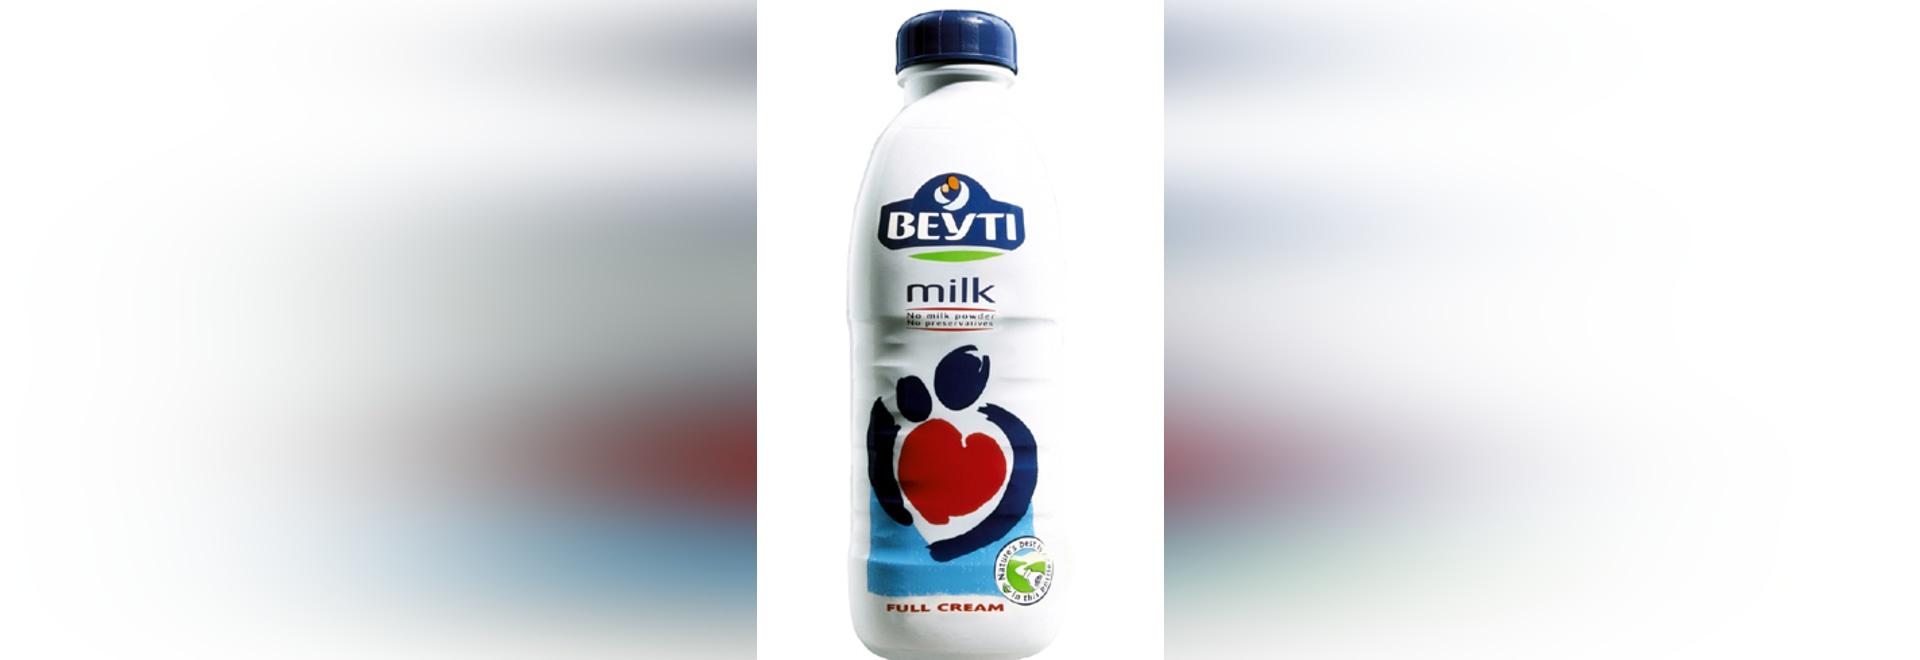 IGI's Beyti branded UHT milk, an innovation in the Egyptian domestic milk market.